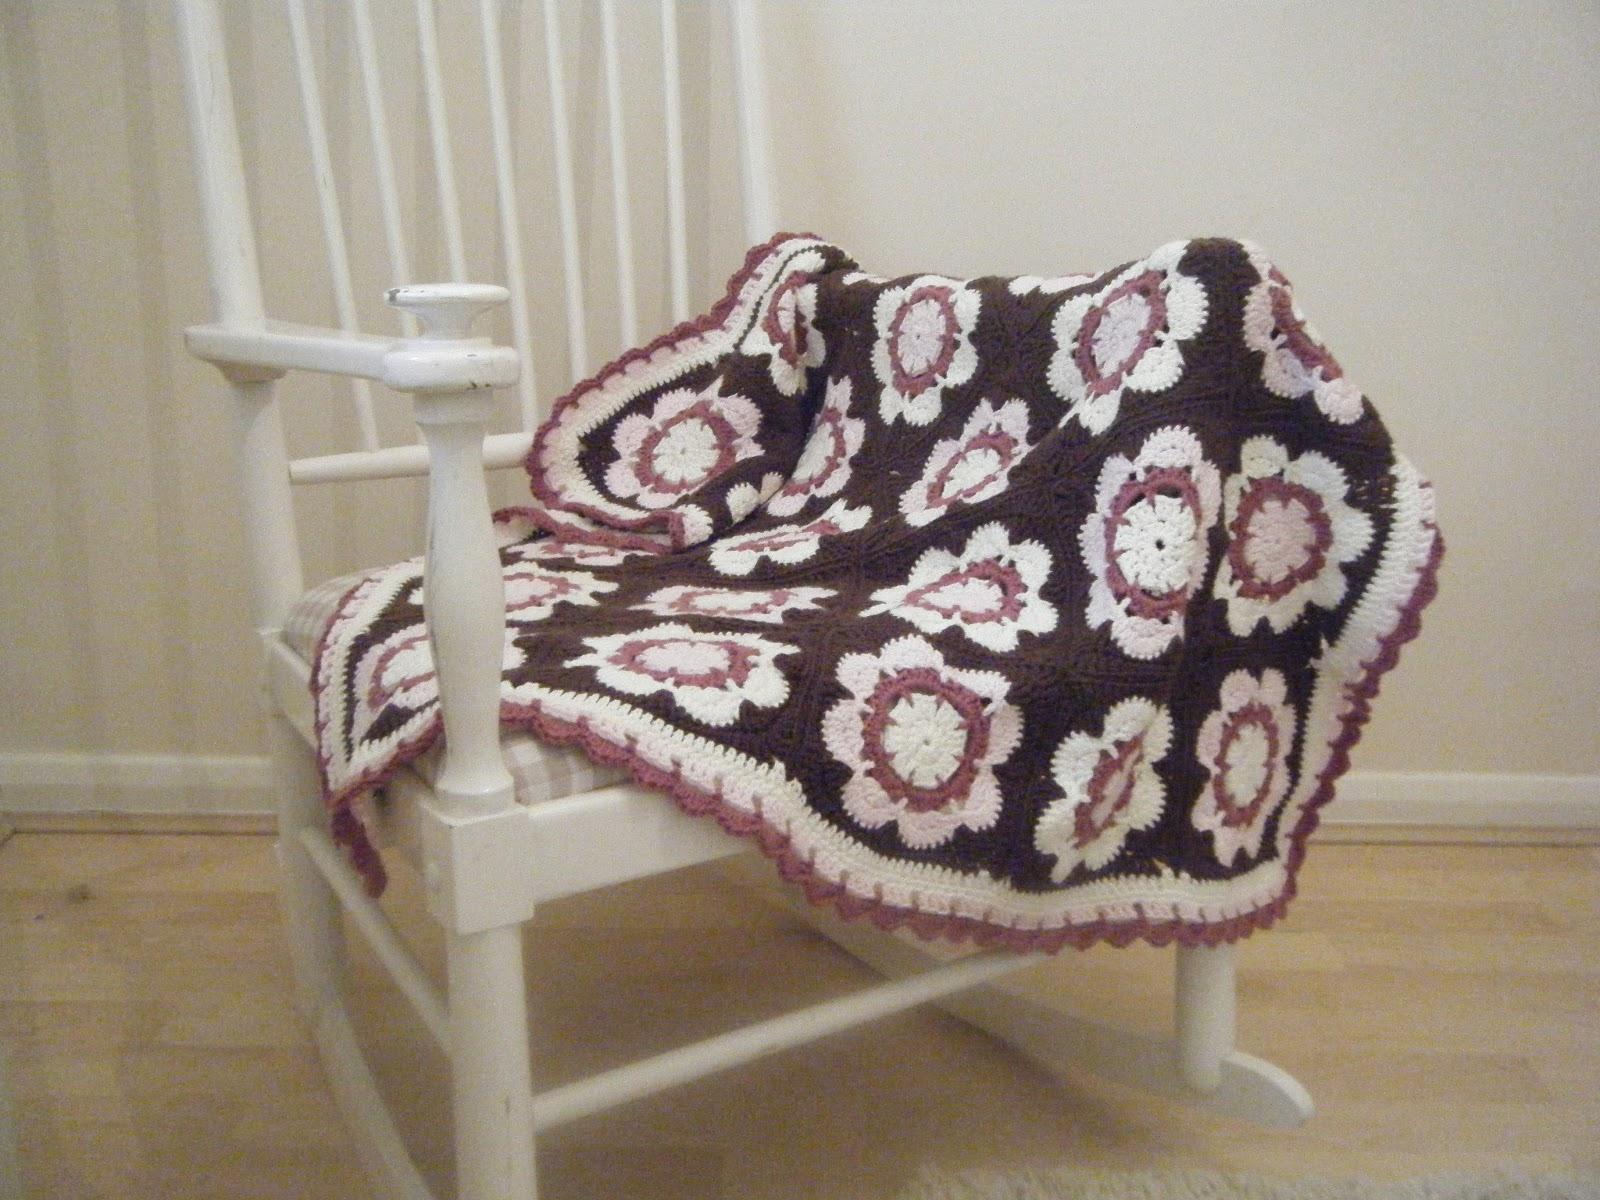 Crochet Primrose Square Blanket